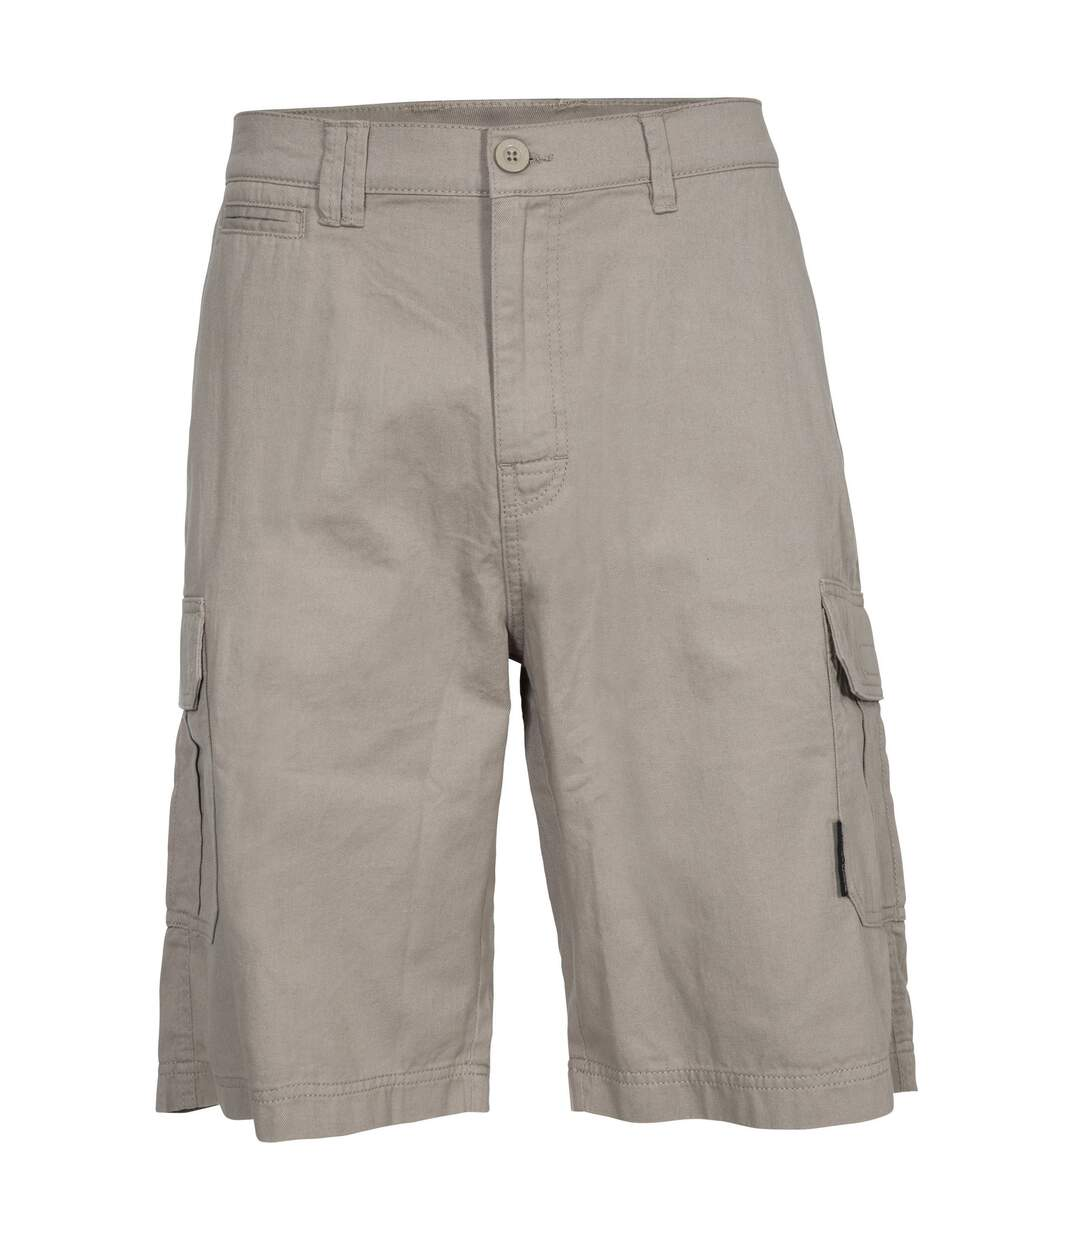 Shorts Trespass Gally Homme Gally